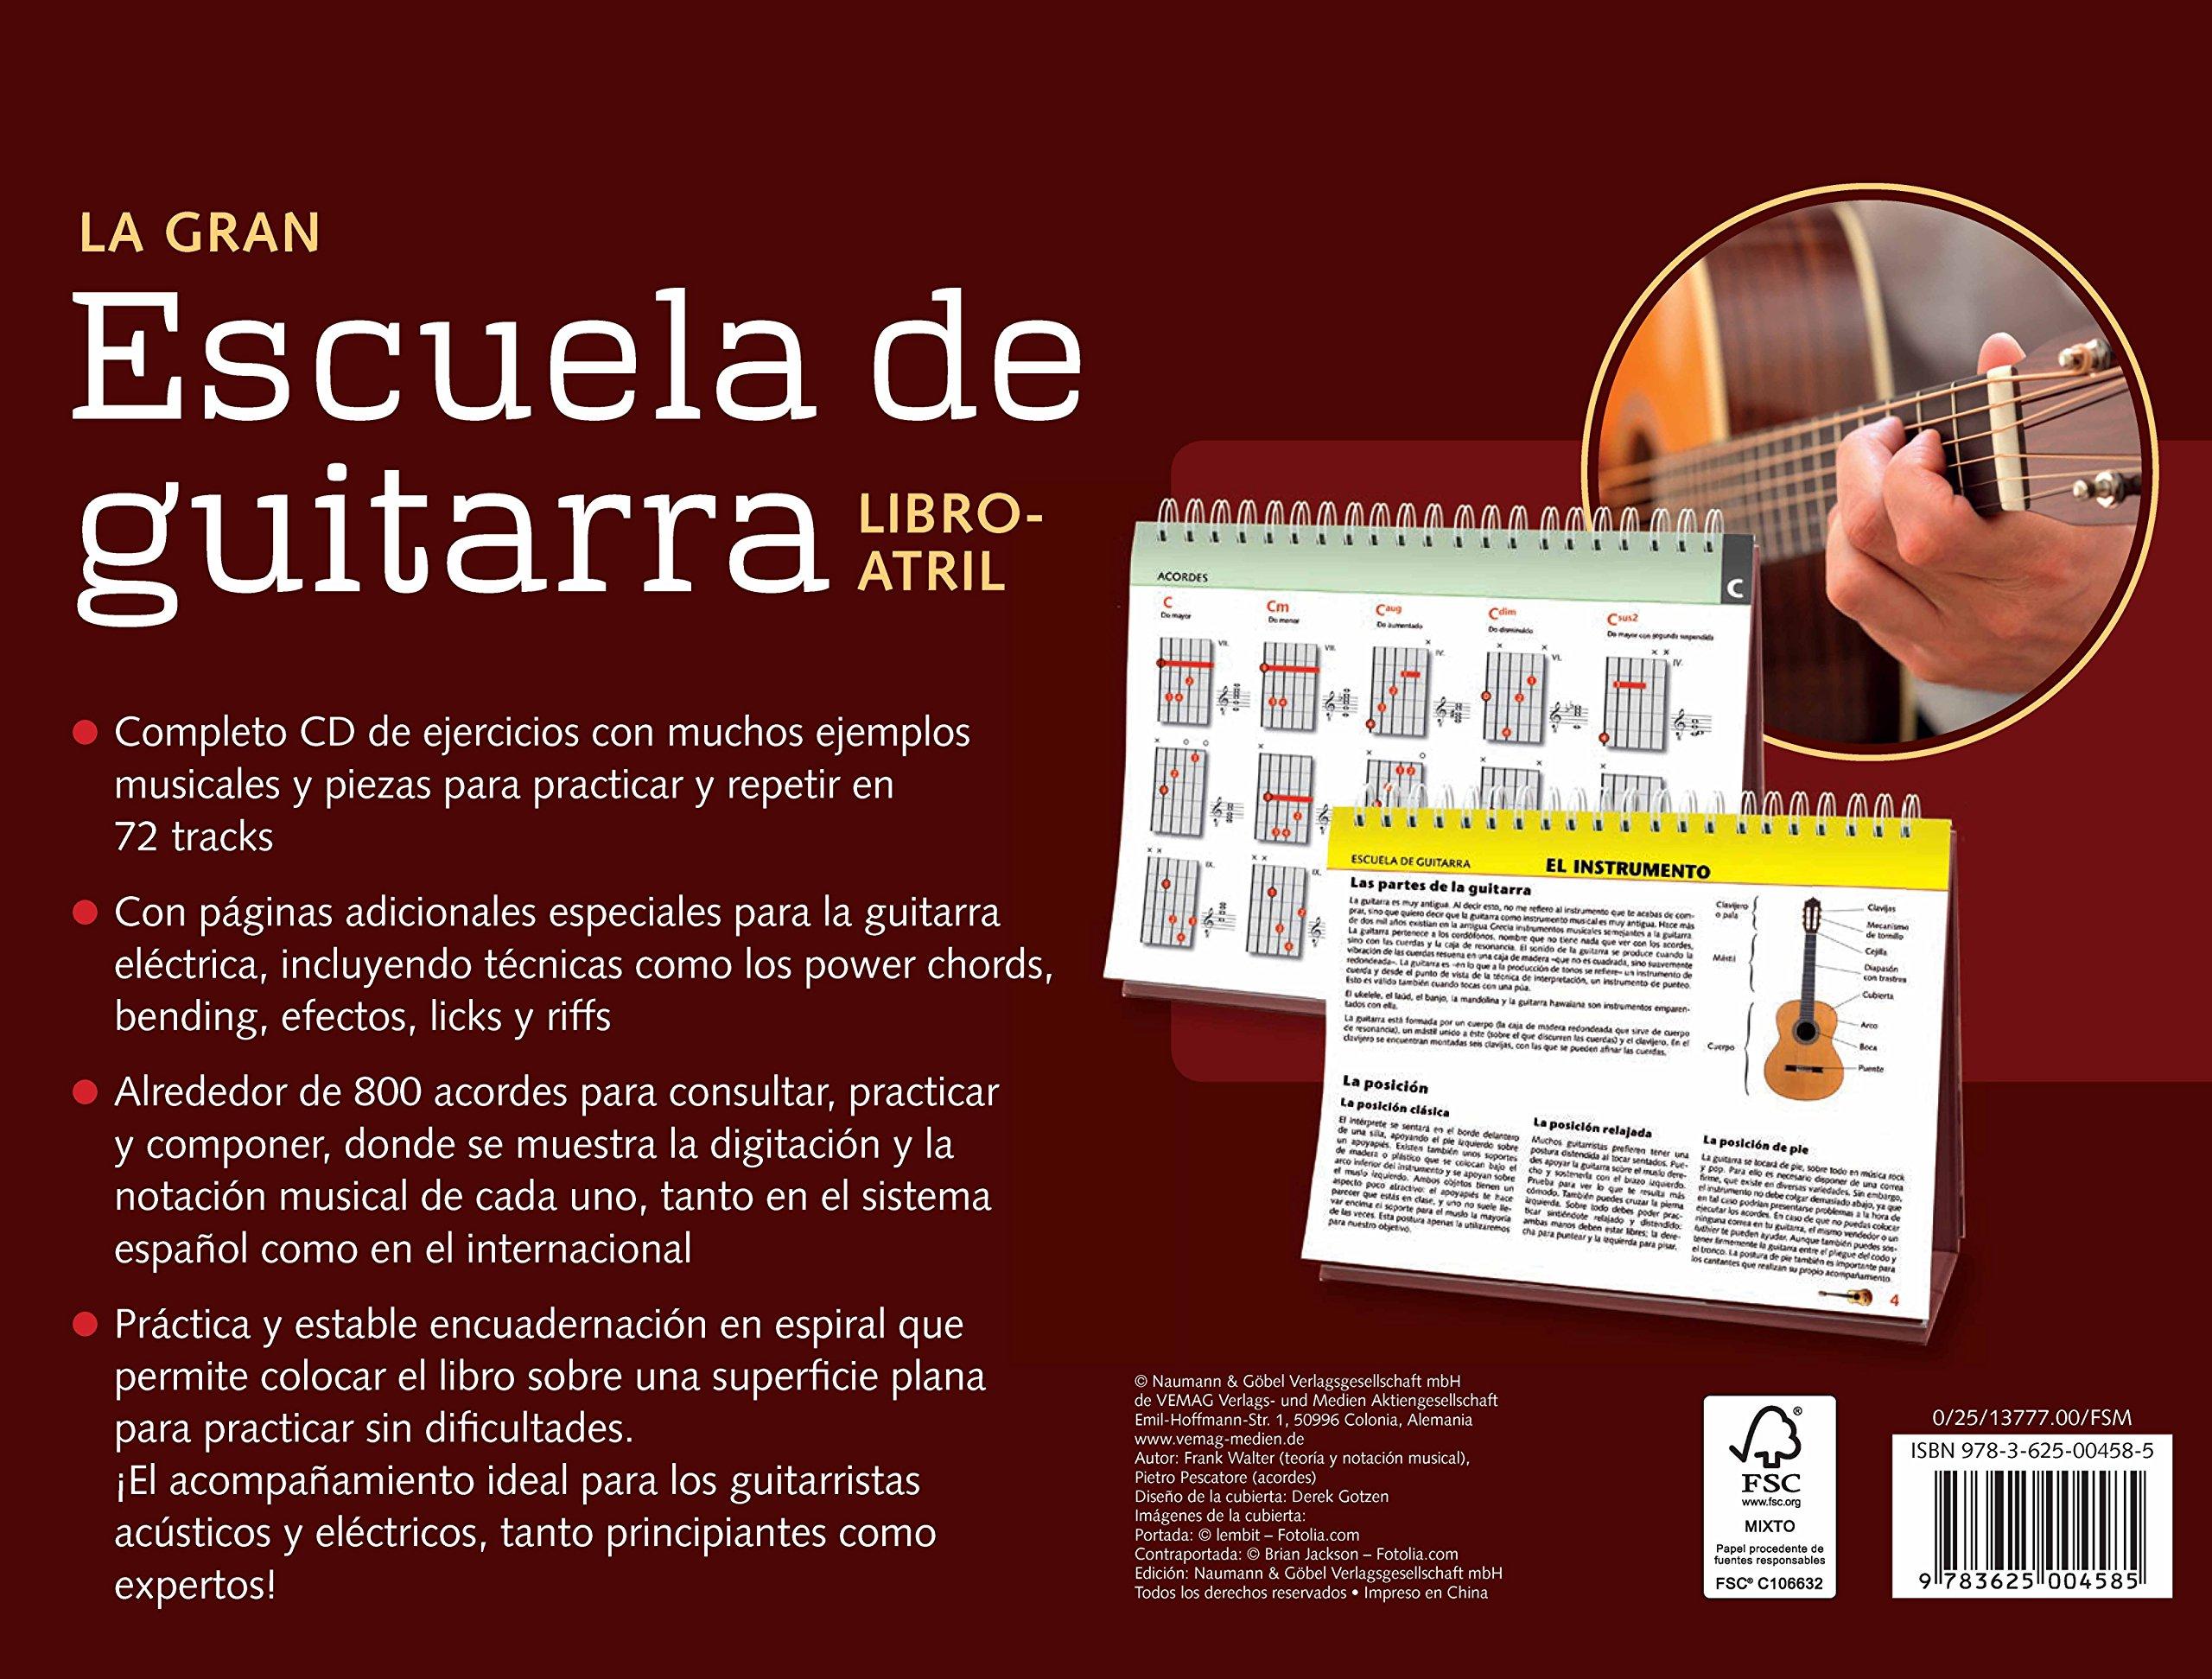 LA GRAN ESCUELA DE GUITARRA NGV: Varios: 9783625004585: Amazon.com: Books